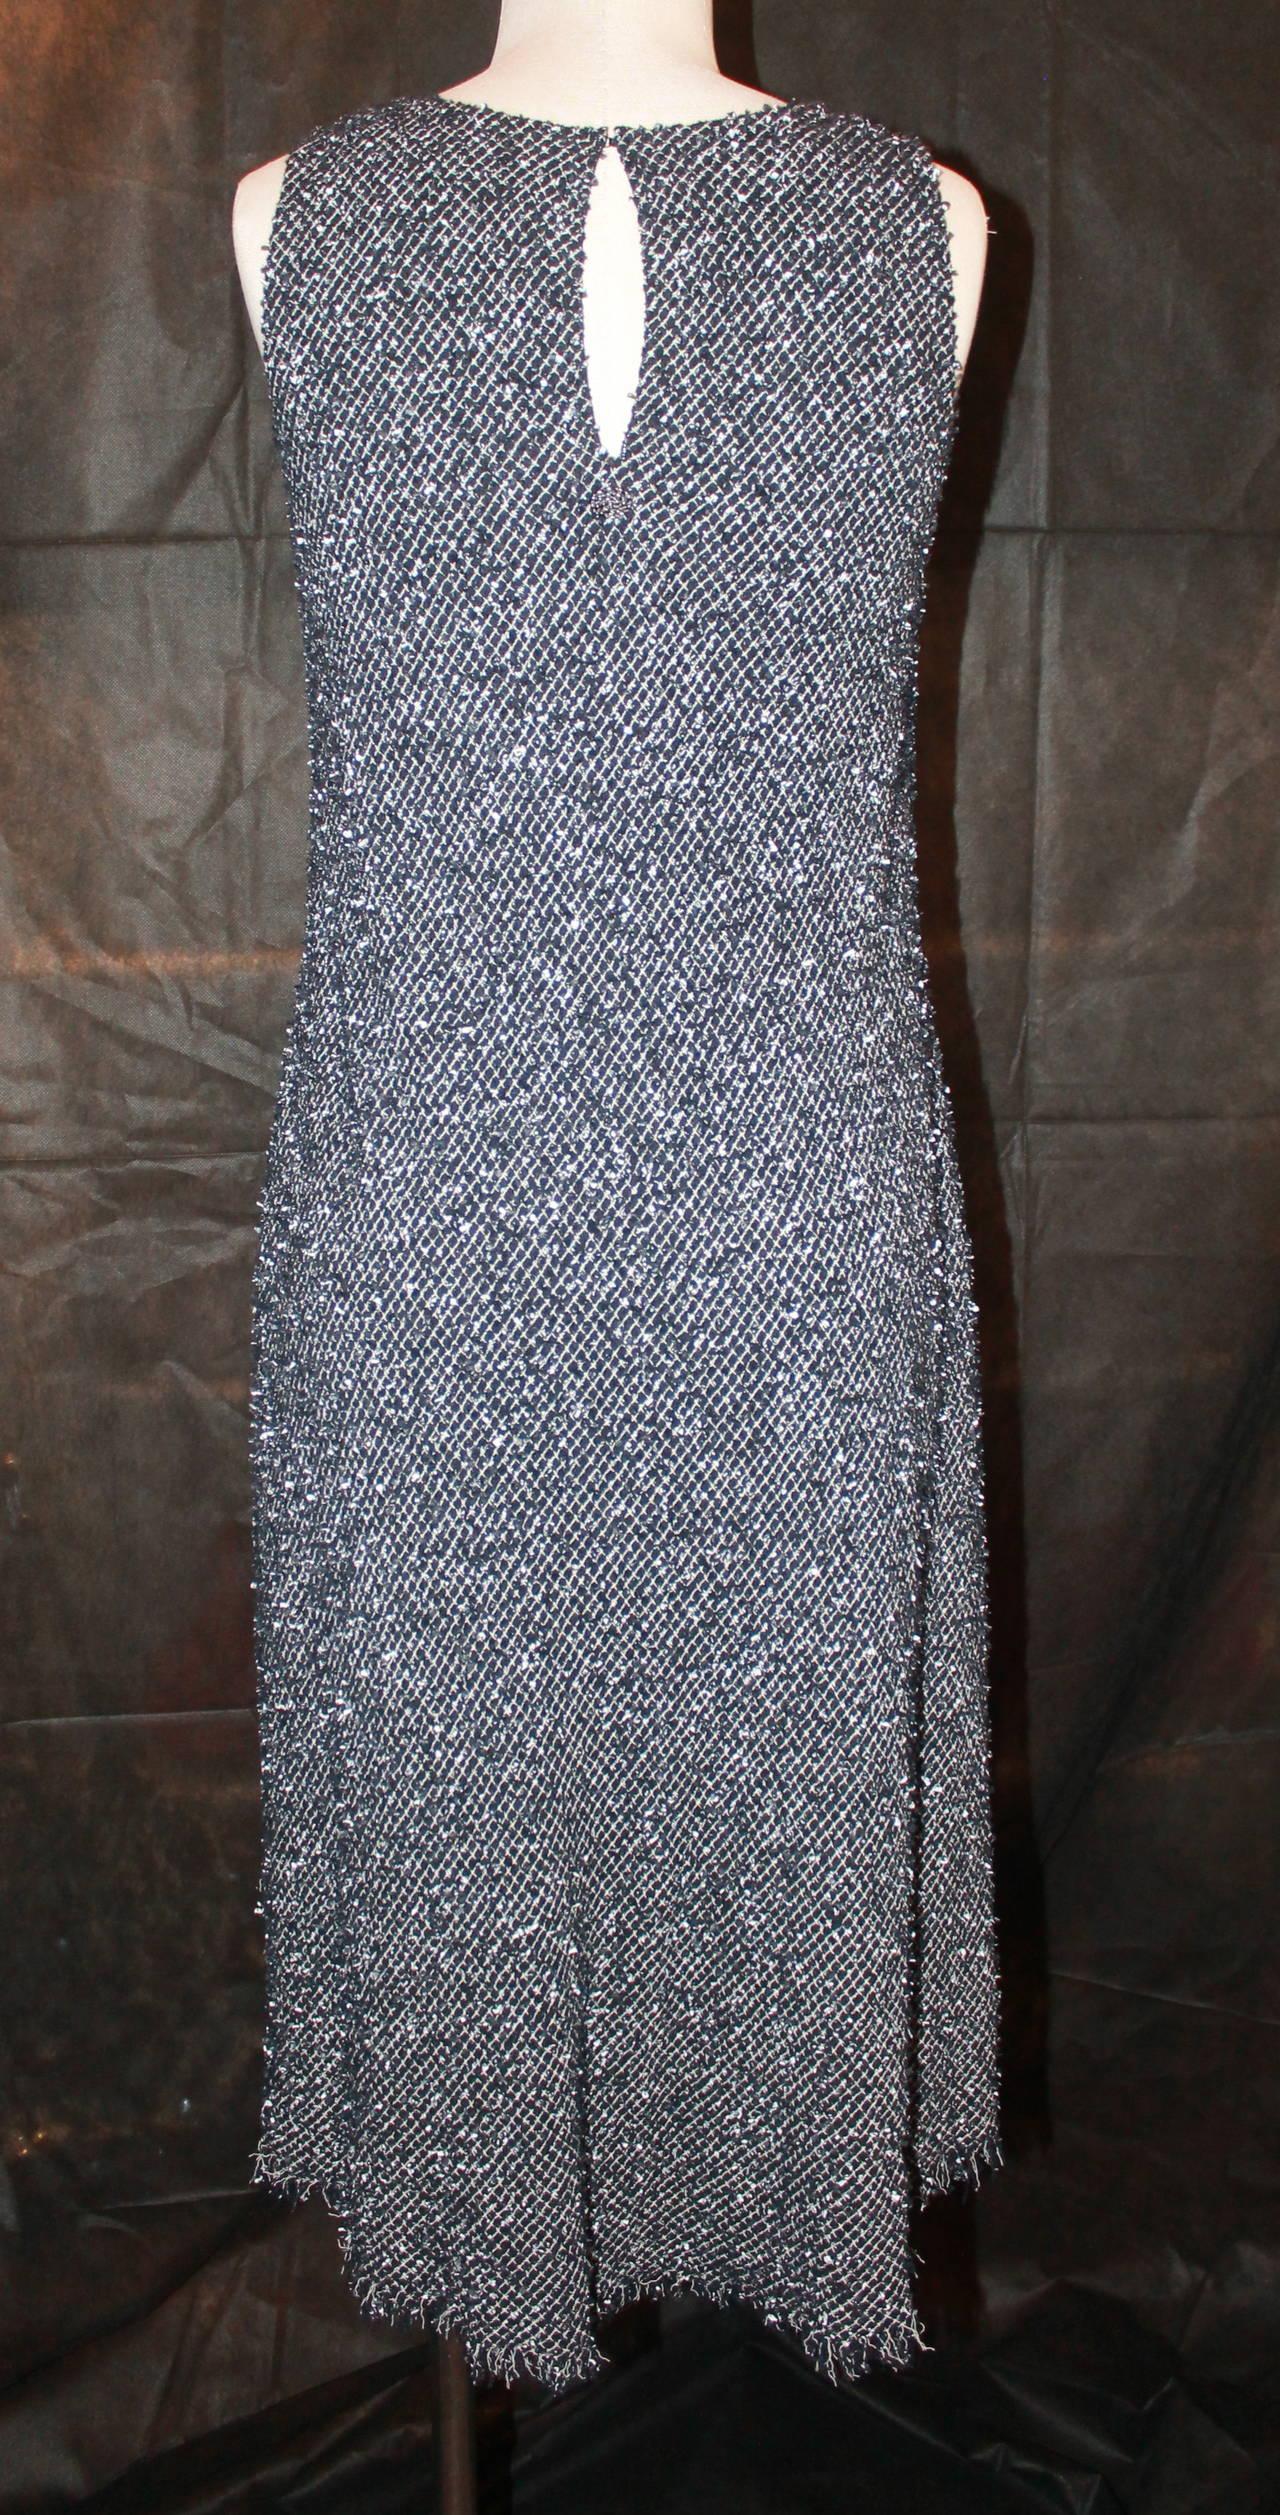 Chanel Black & White Tweed High-Low Dress - 38 3